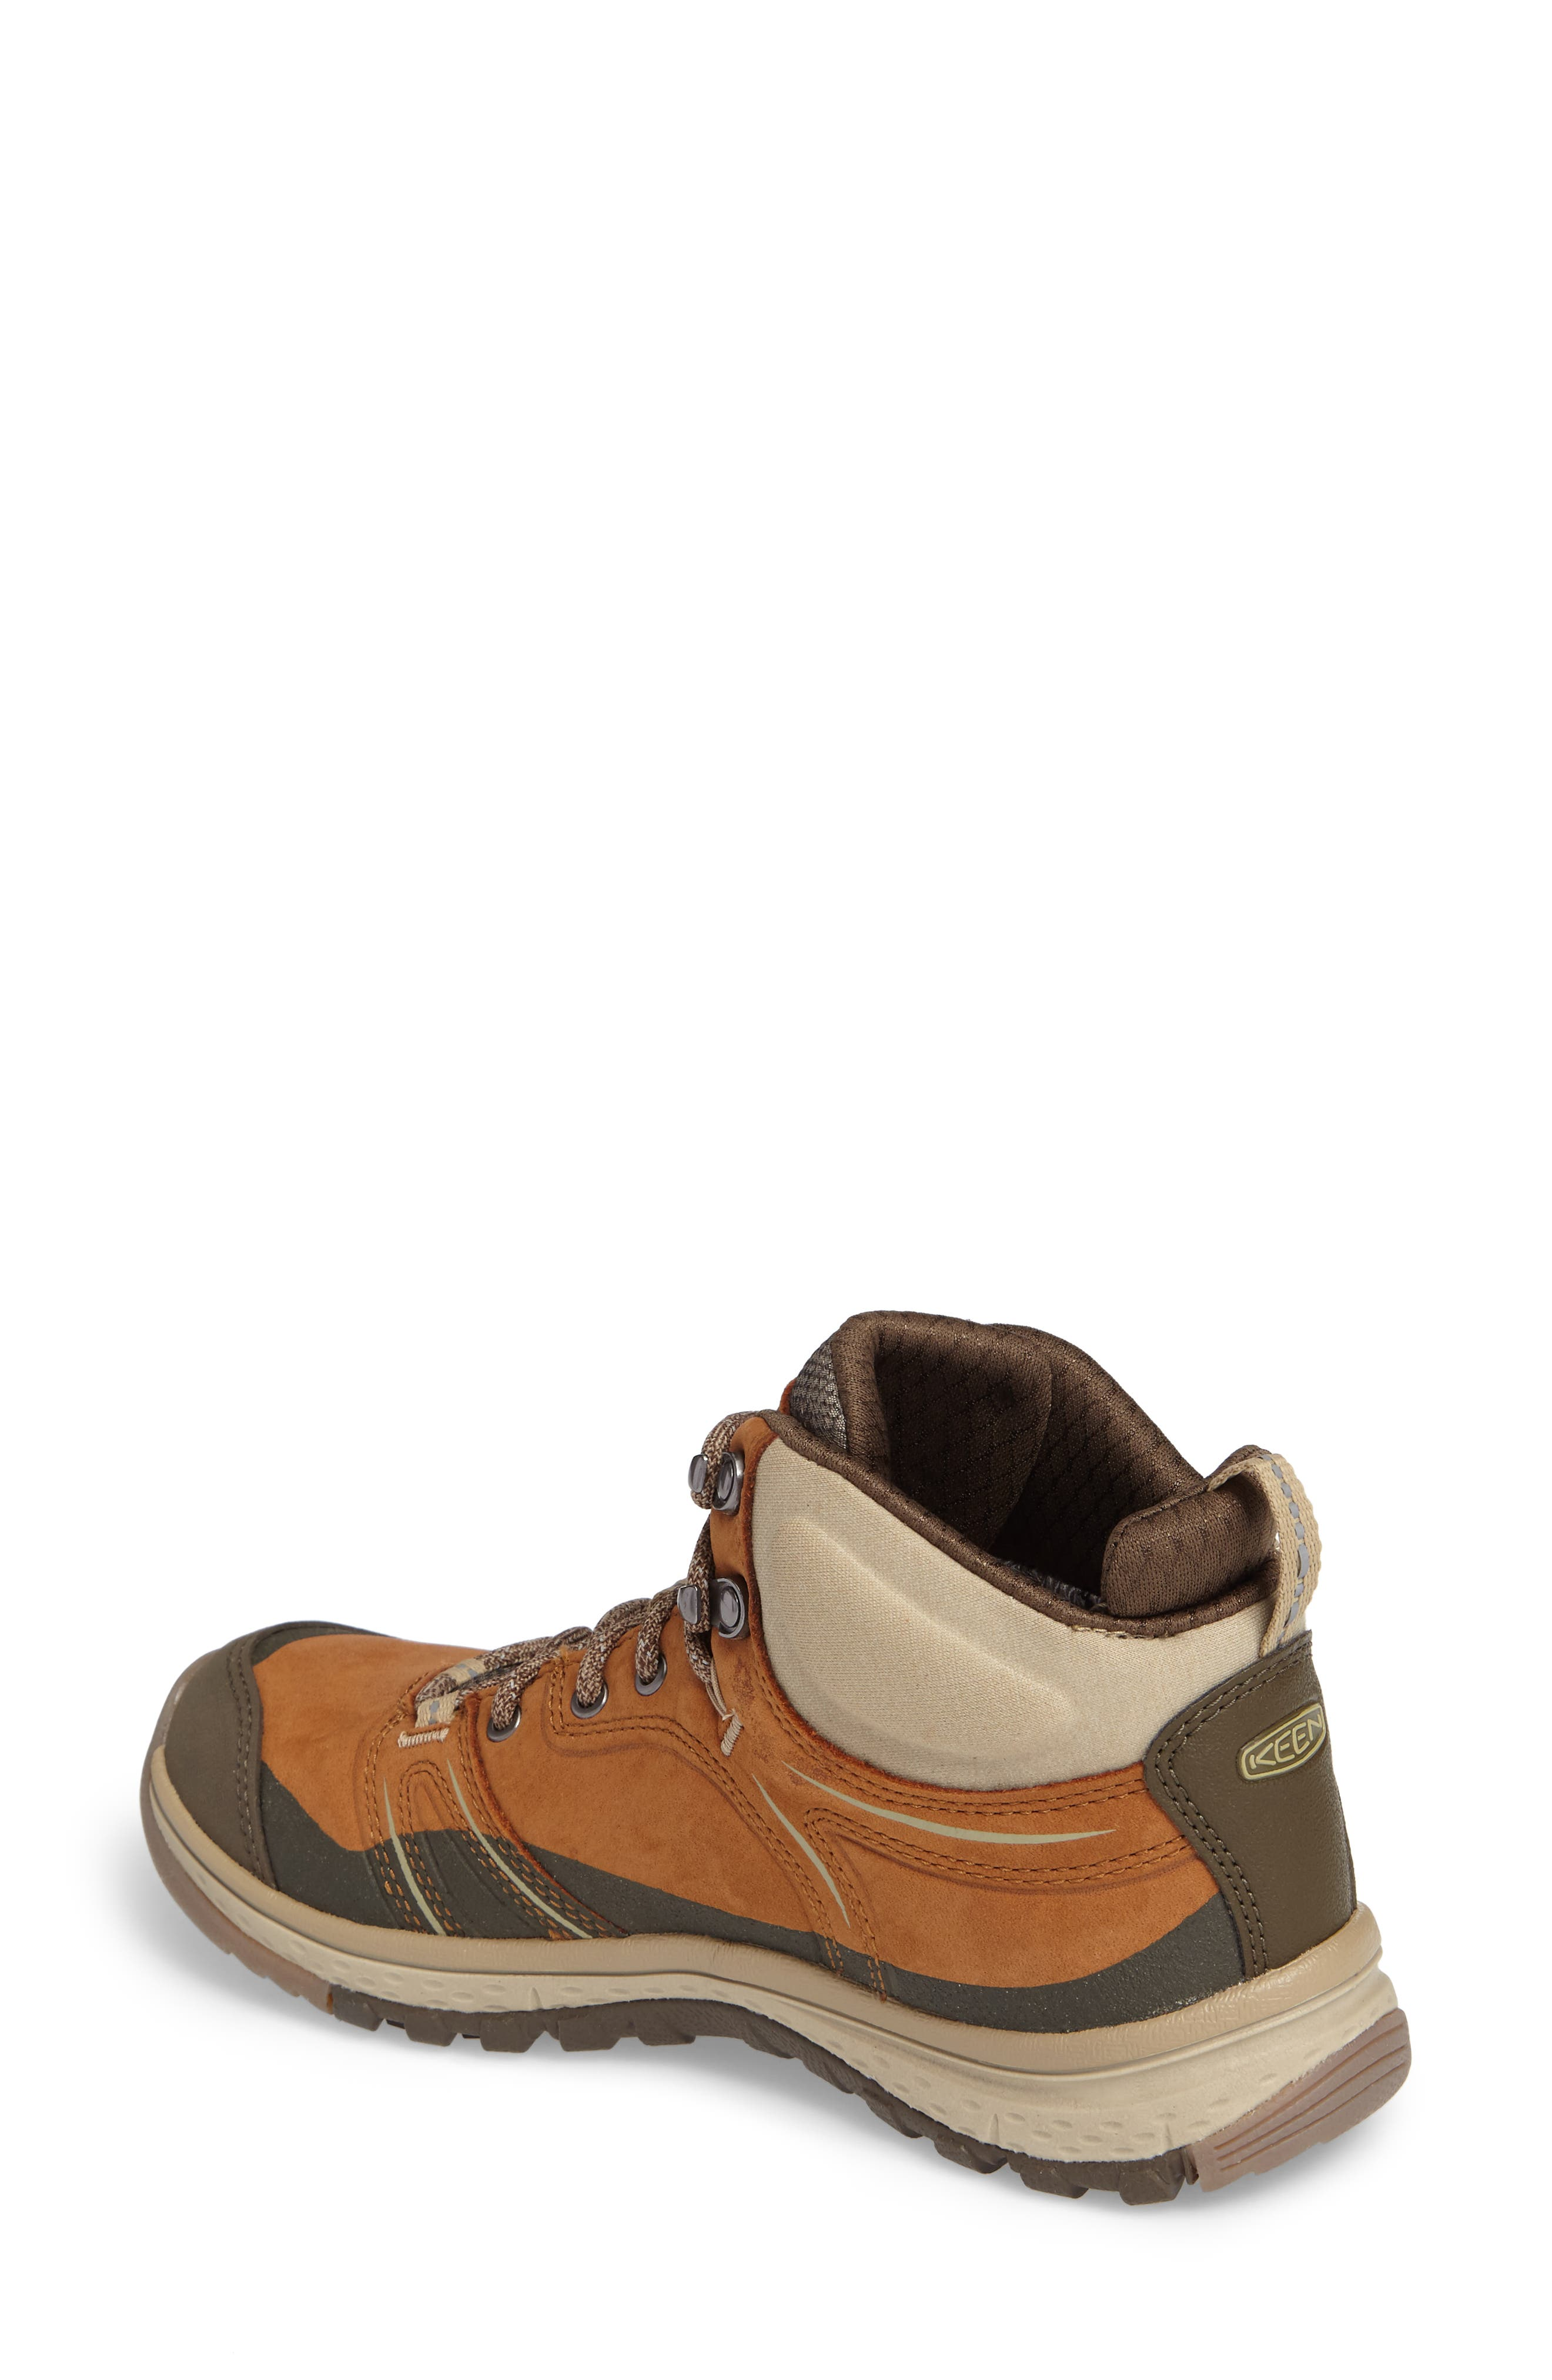 KEEN, Terradora Leather Waterproof Hiking Boot, Alternate thumbnail 2, color, TIMBER/ ORANGE NUBUCK